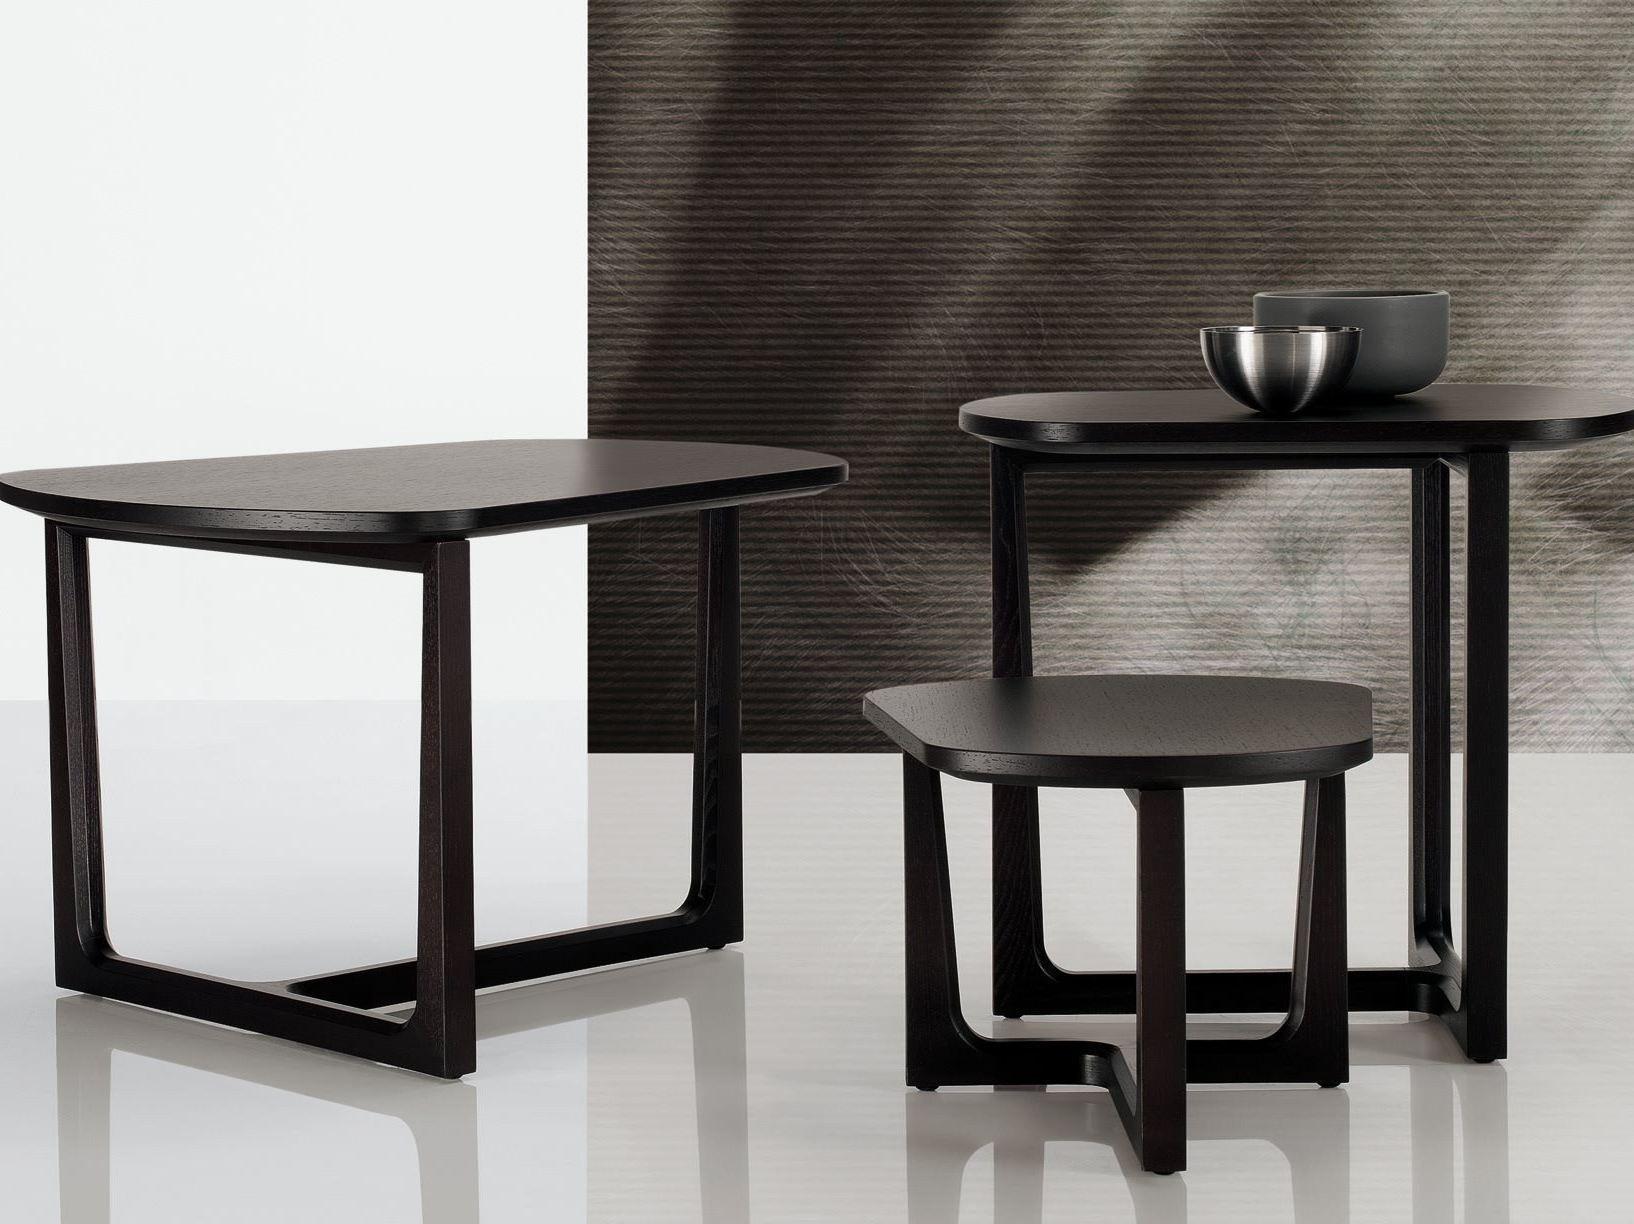 Home products chairs ics ipsilon - Home Products Chairs Ics Ipsilon 51